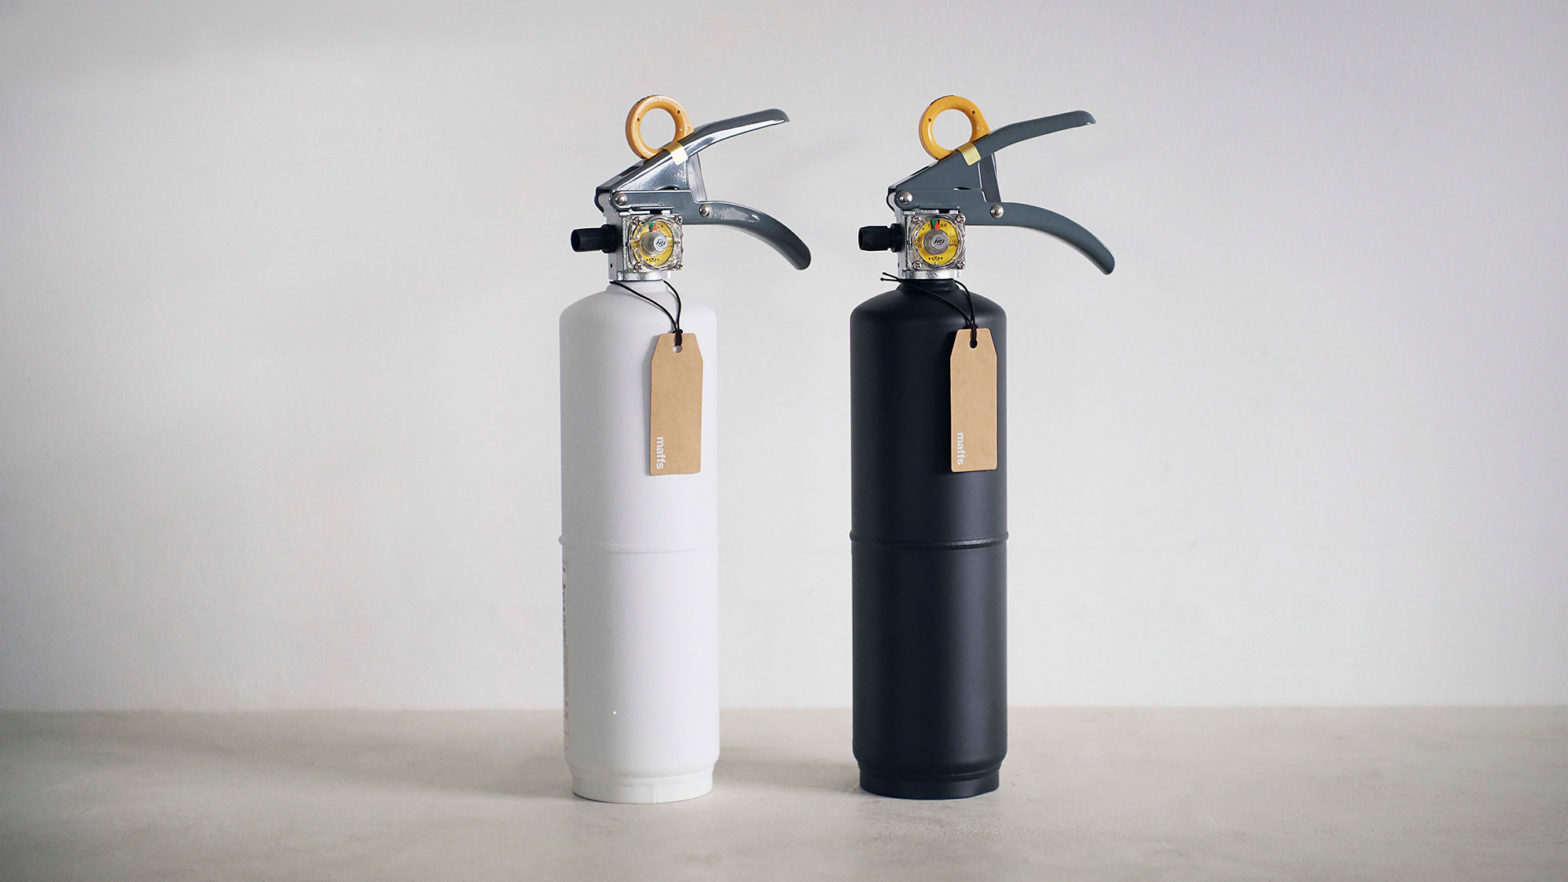 +maffs Home Use Fire Extinguisher